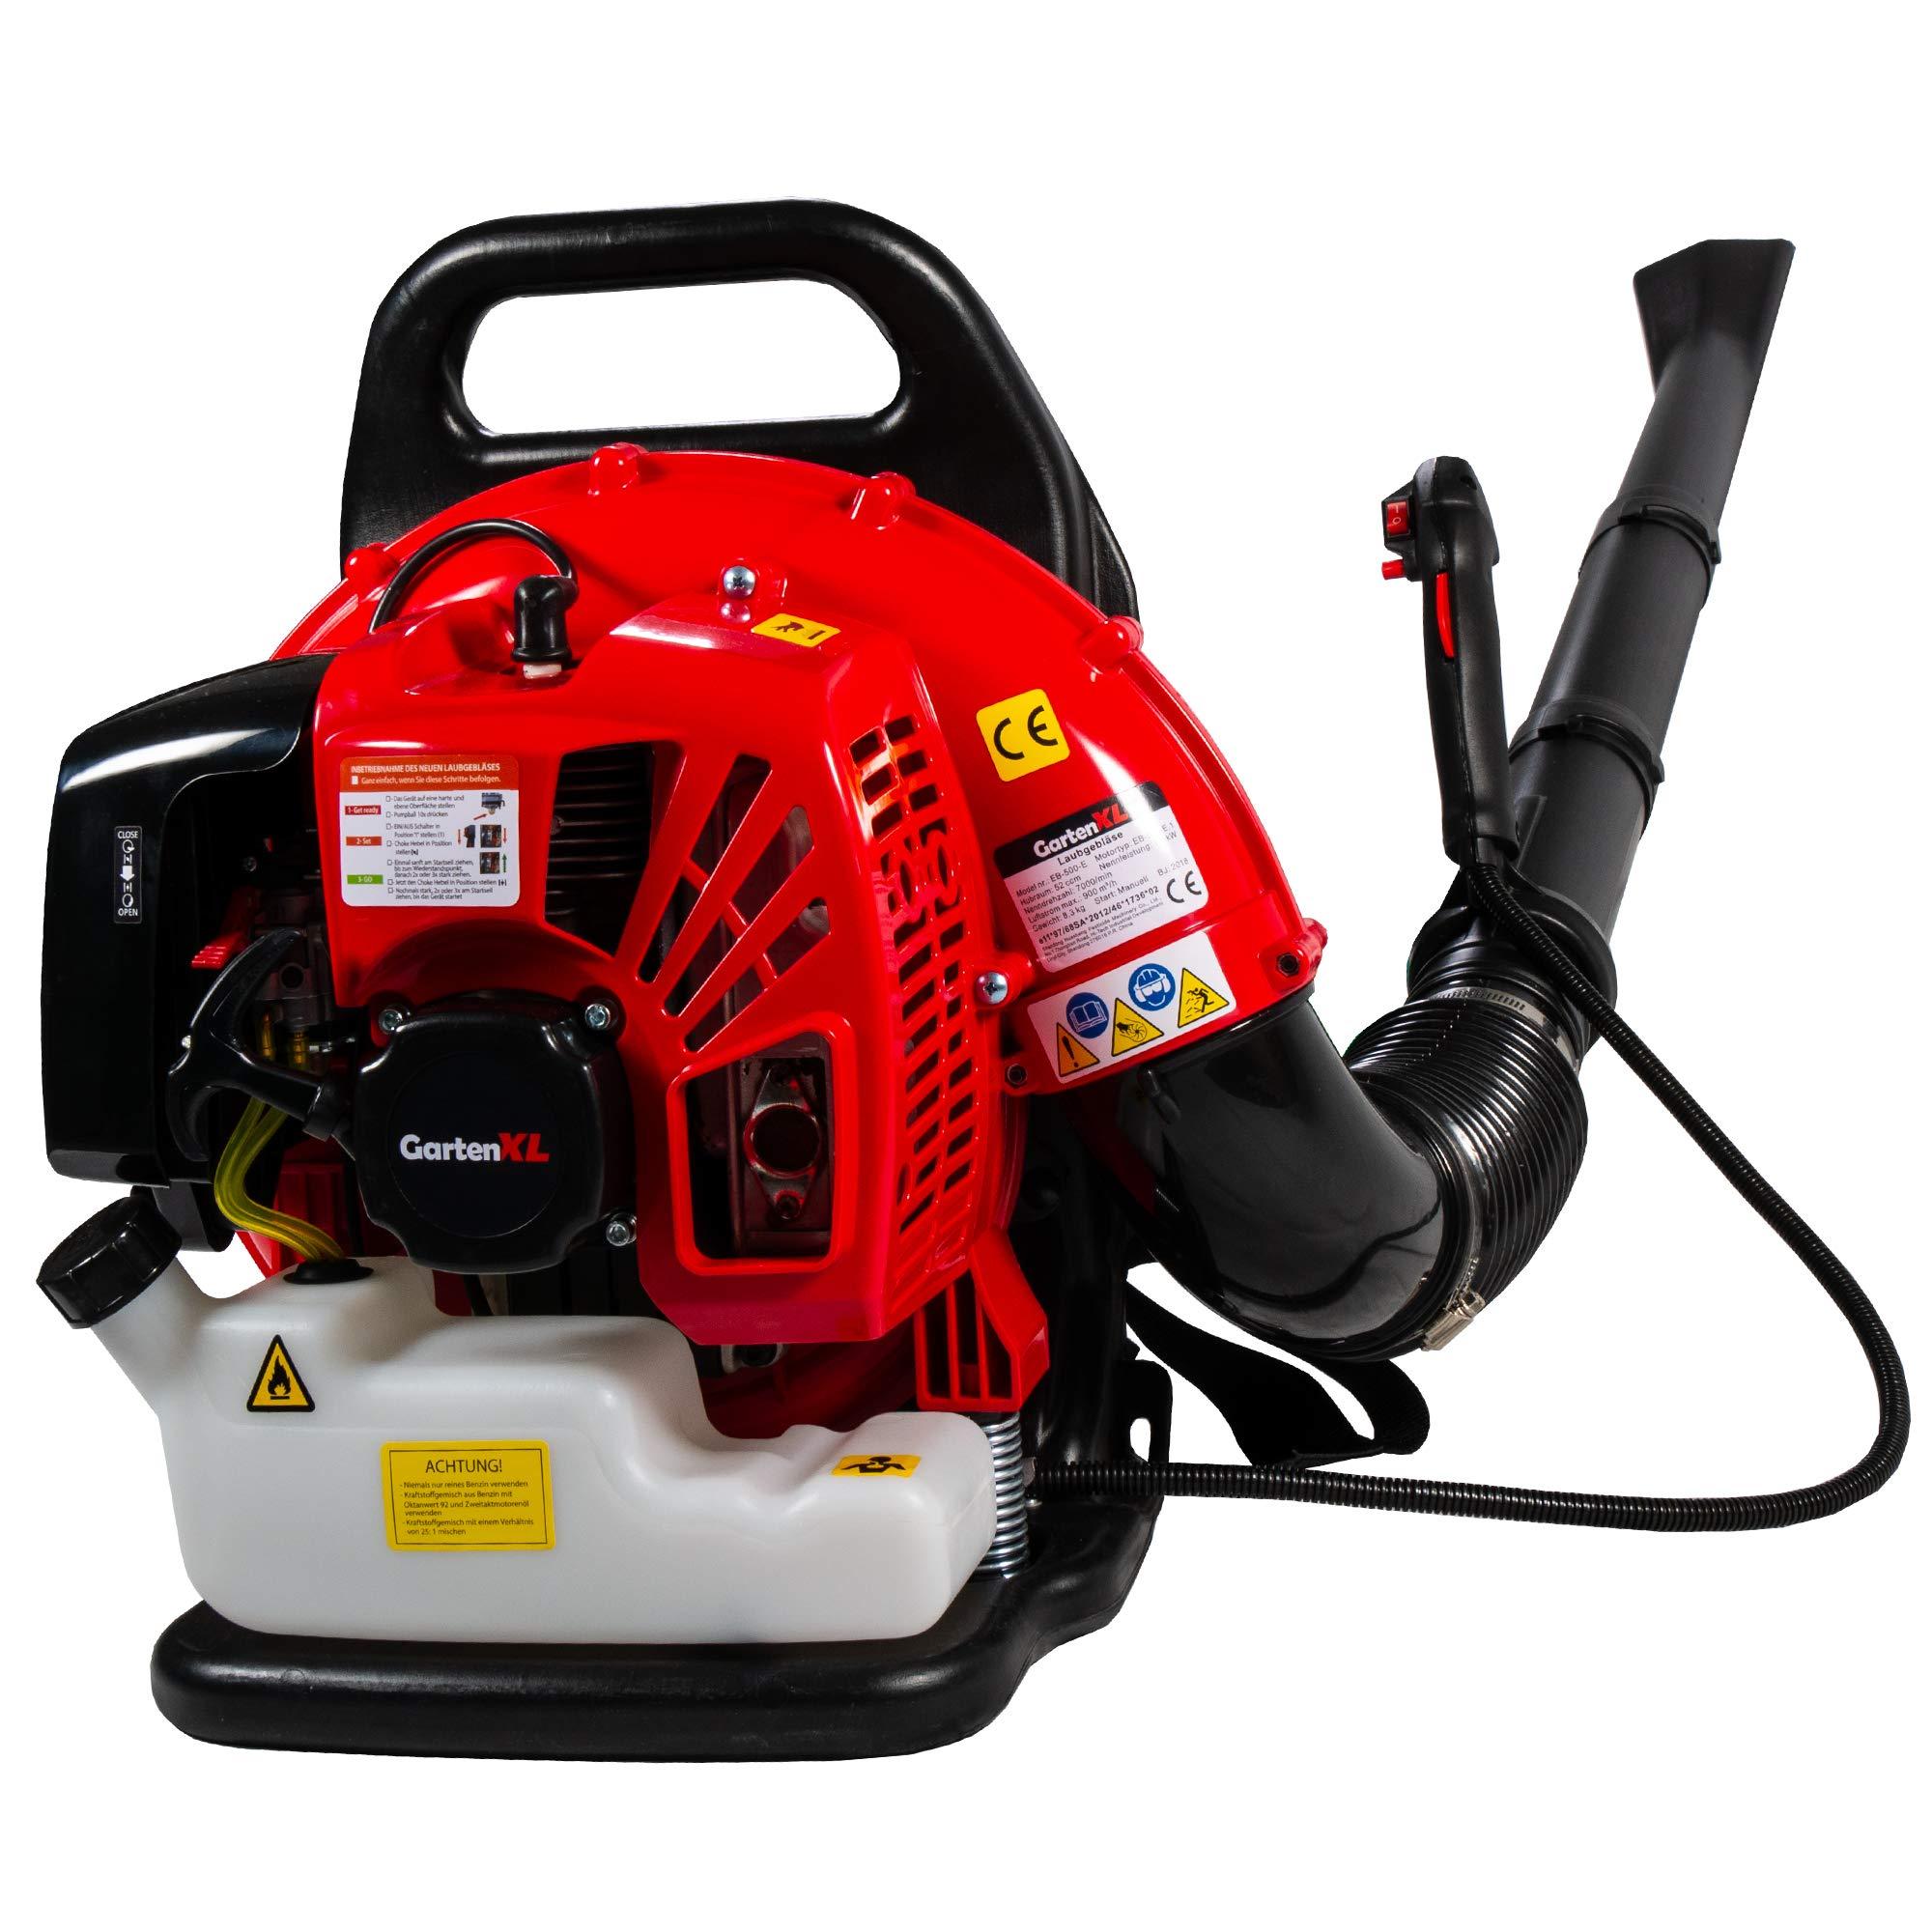 GartenXL EB-500-E 2-Takt Benzin-Laubbläser mit Rückenpolsterung, 2 PS